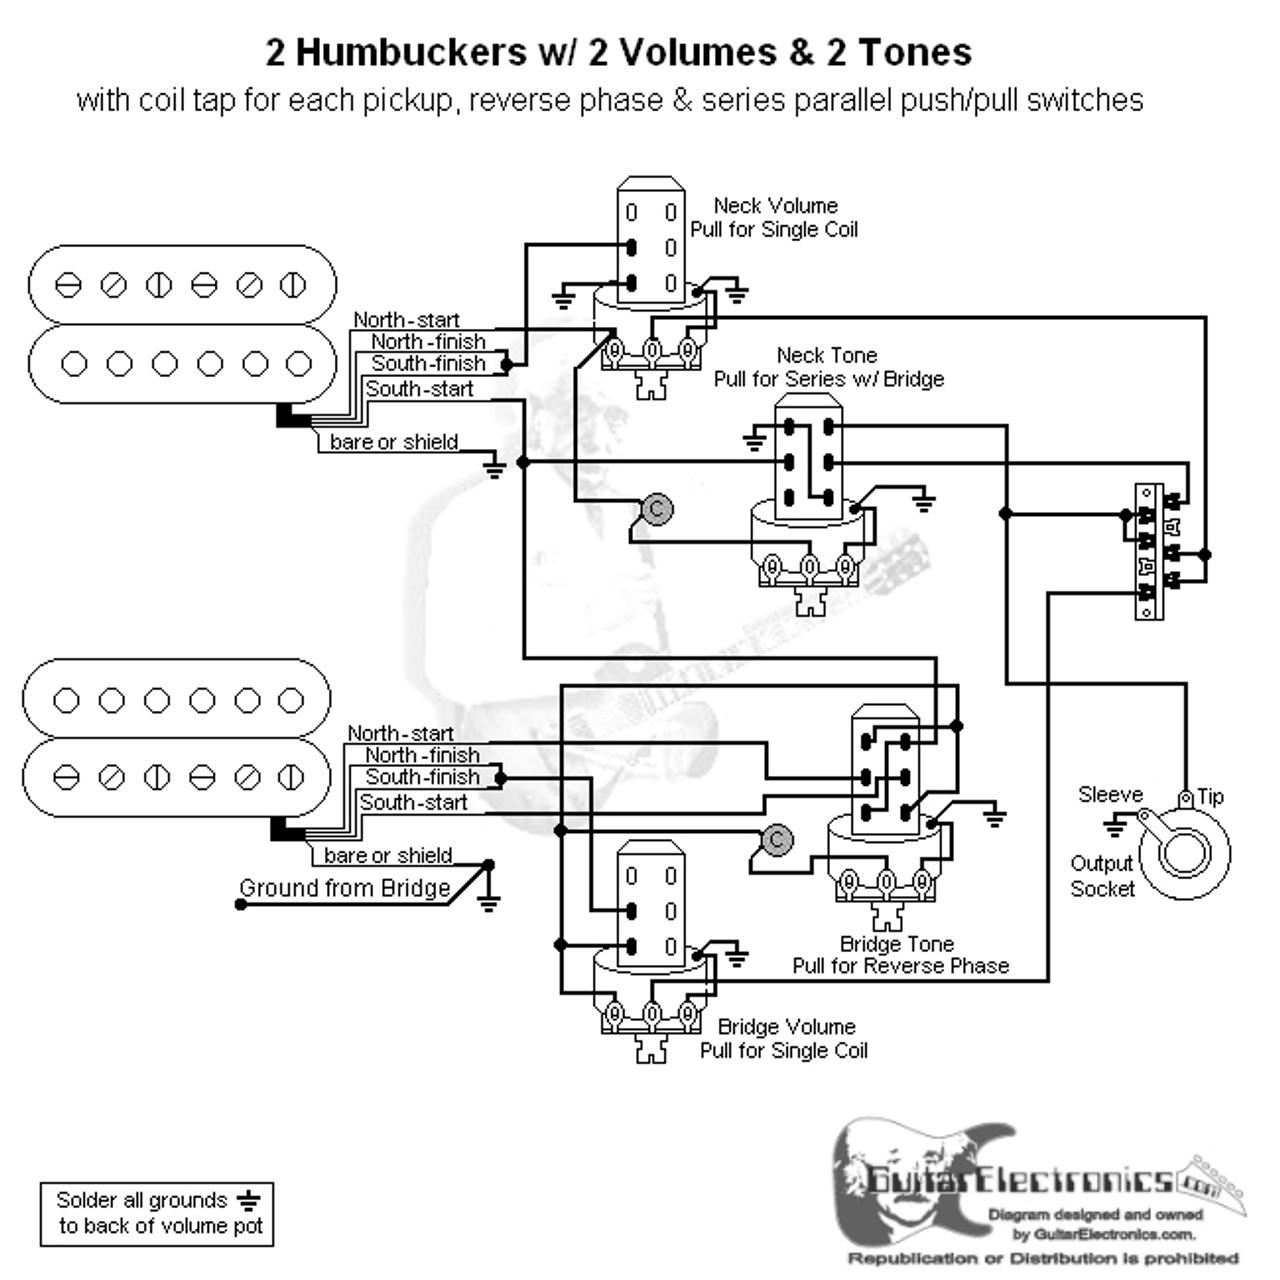 2 hbs 3 way lever 1 vol 2 tones coil tap u0026 series parallel  [ 1280 x 1280 Pixel ]